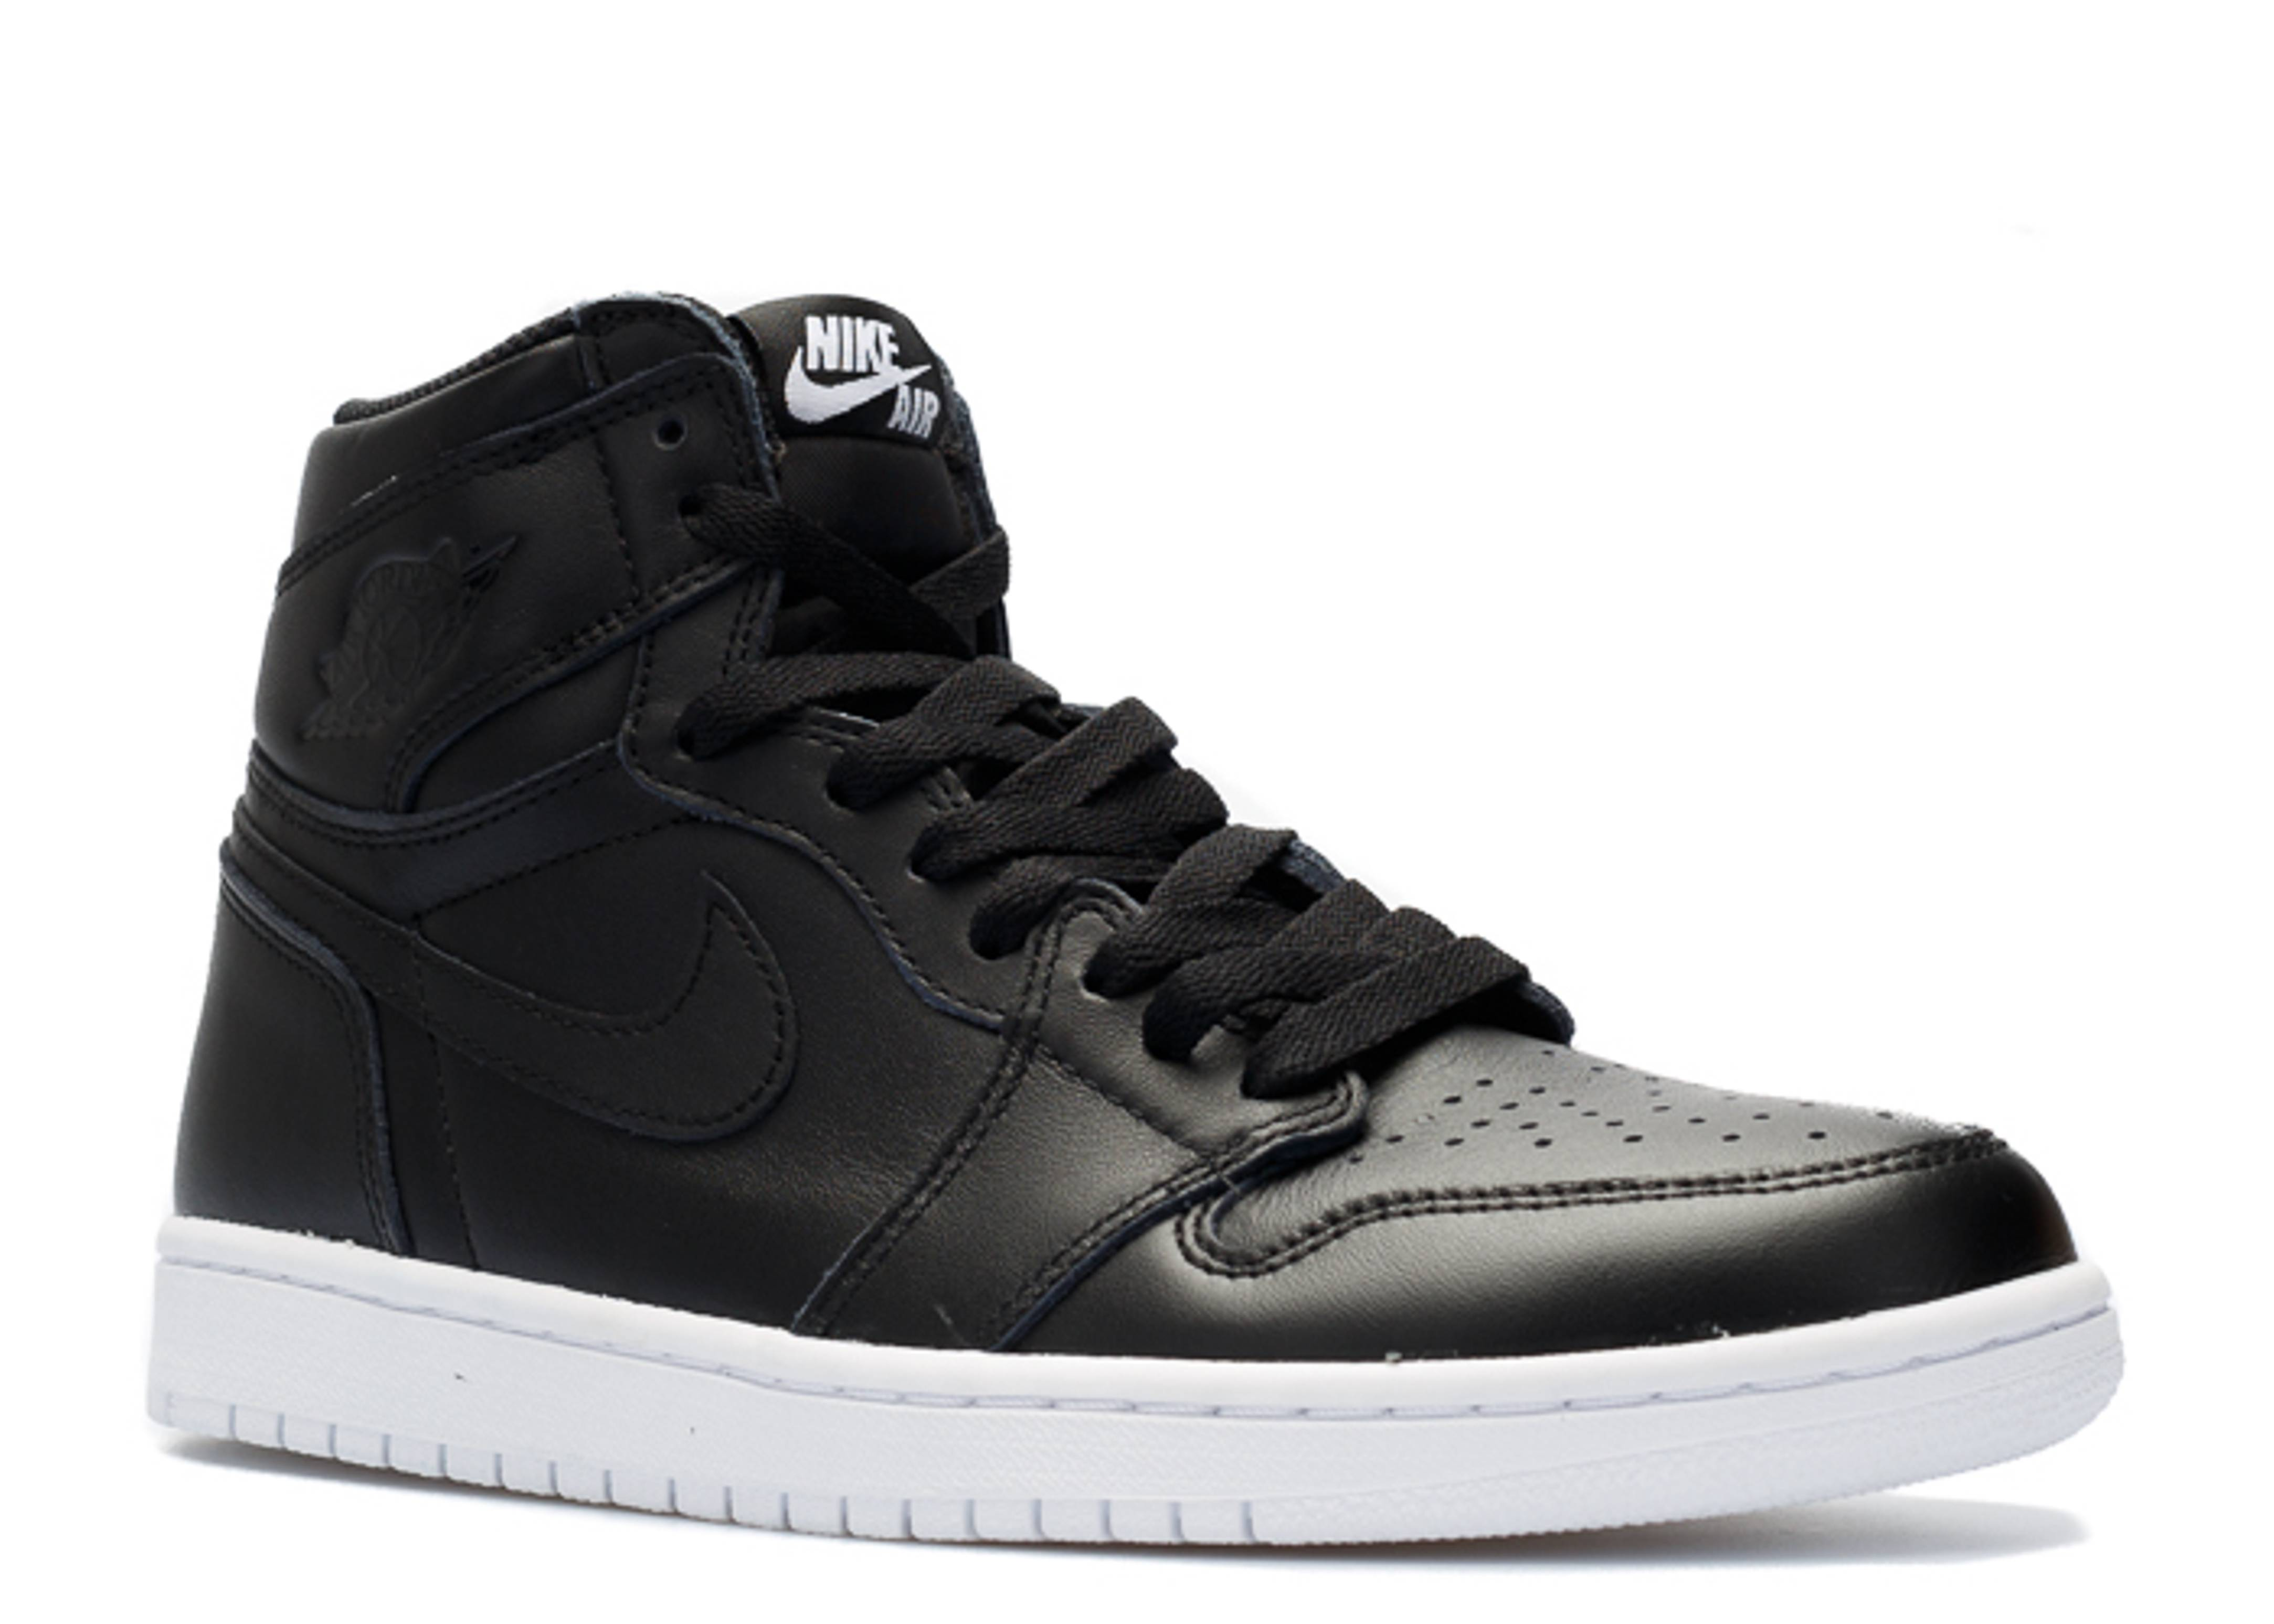 Air Jordan 1 Retro Og